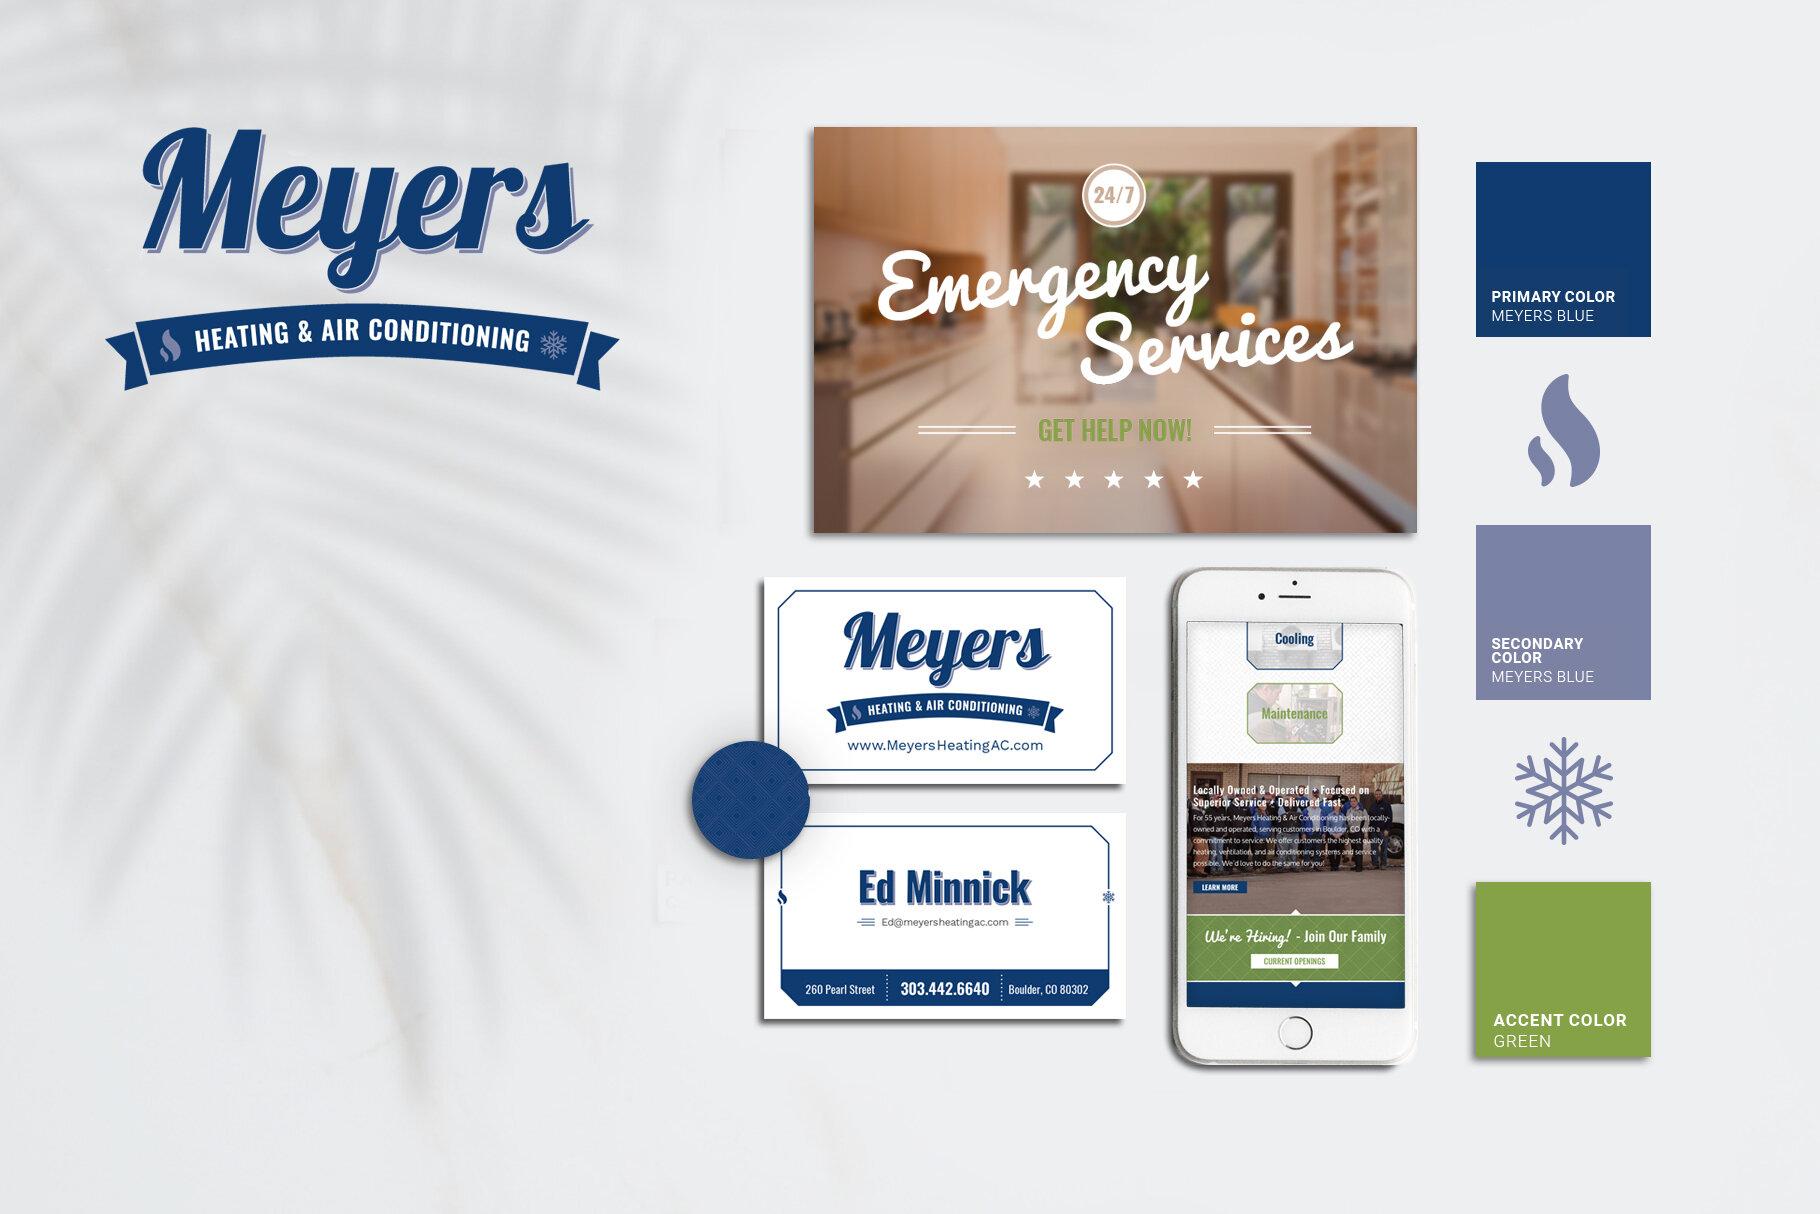 Meryers_logo_moodboard_v1.jpg